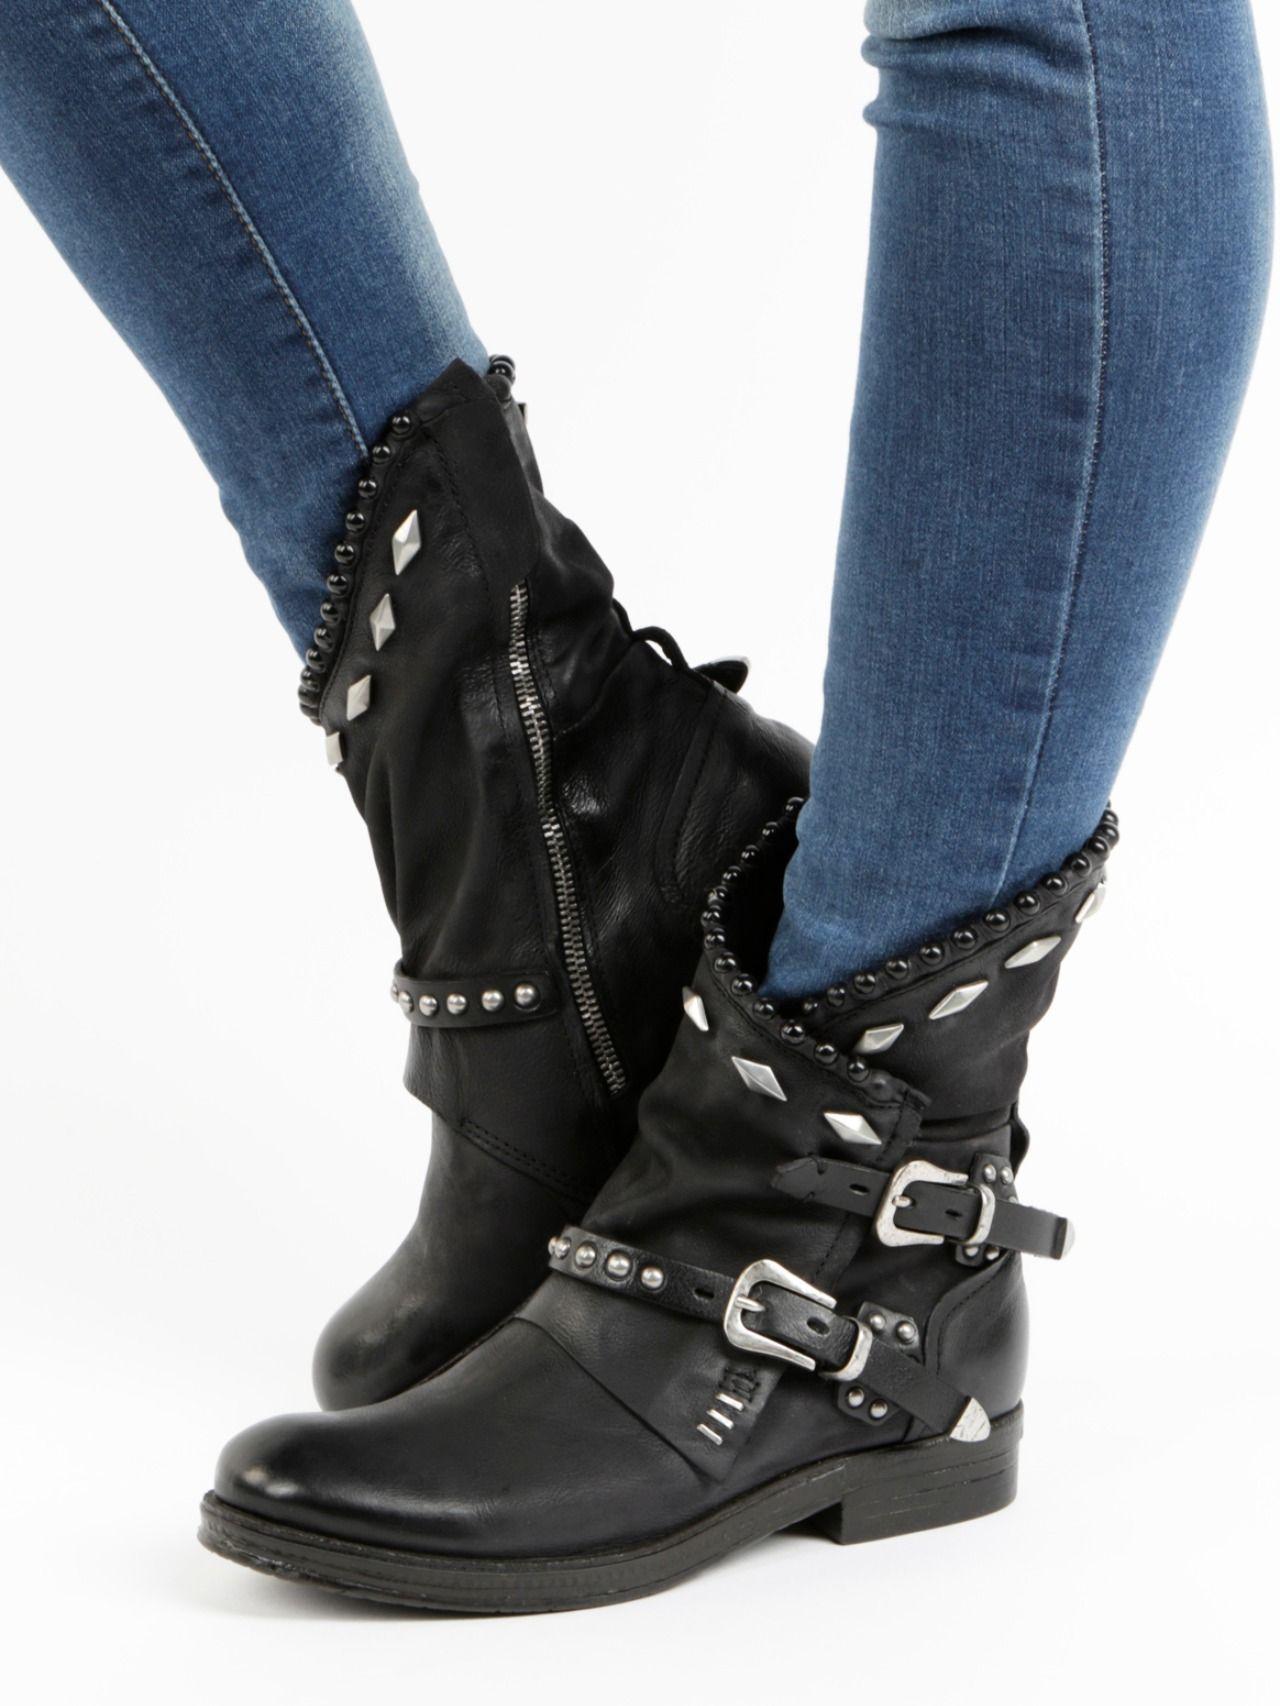 Damen Stiefeletten Biker Boots Gefütterte Booties 832164 Trendy Neu